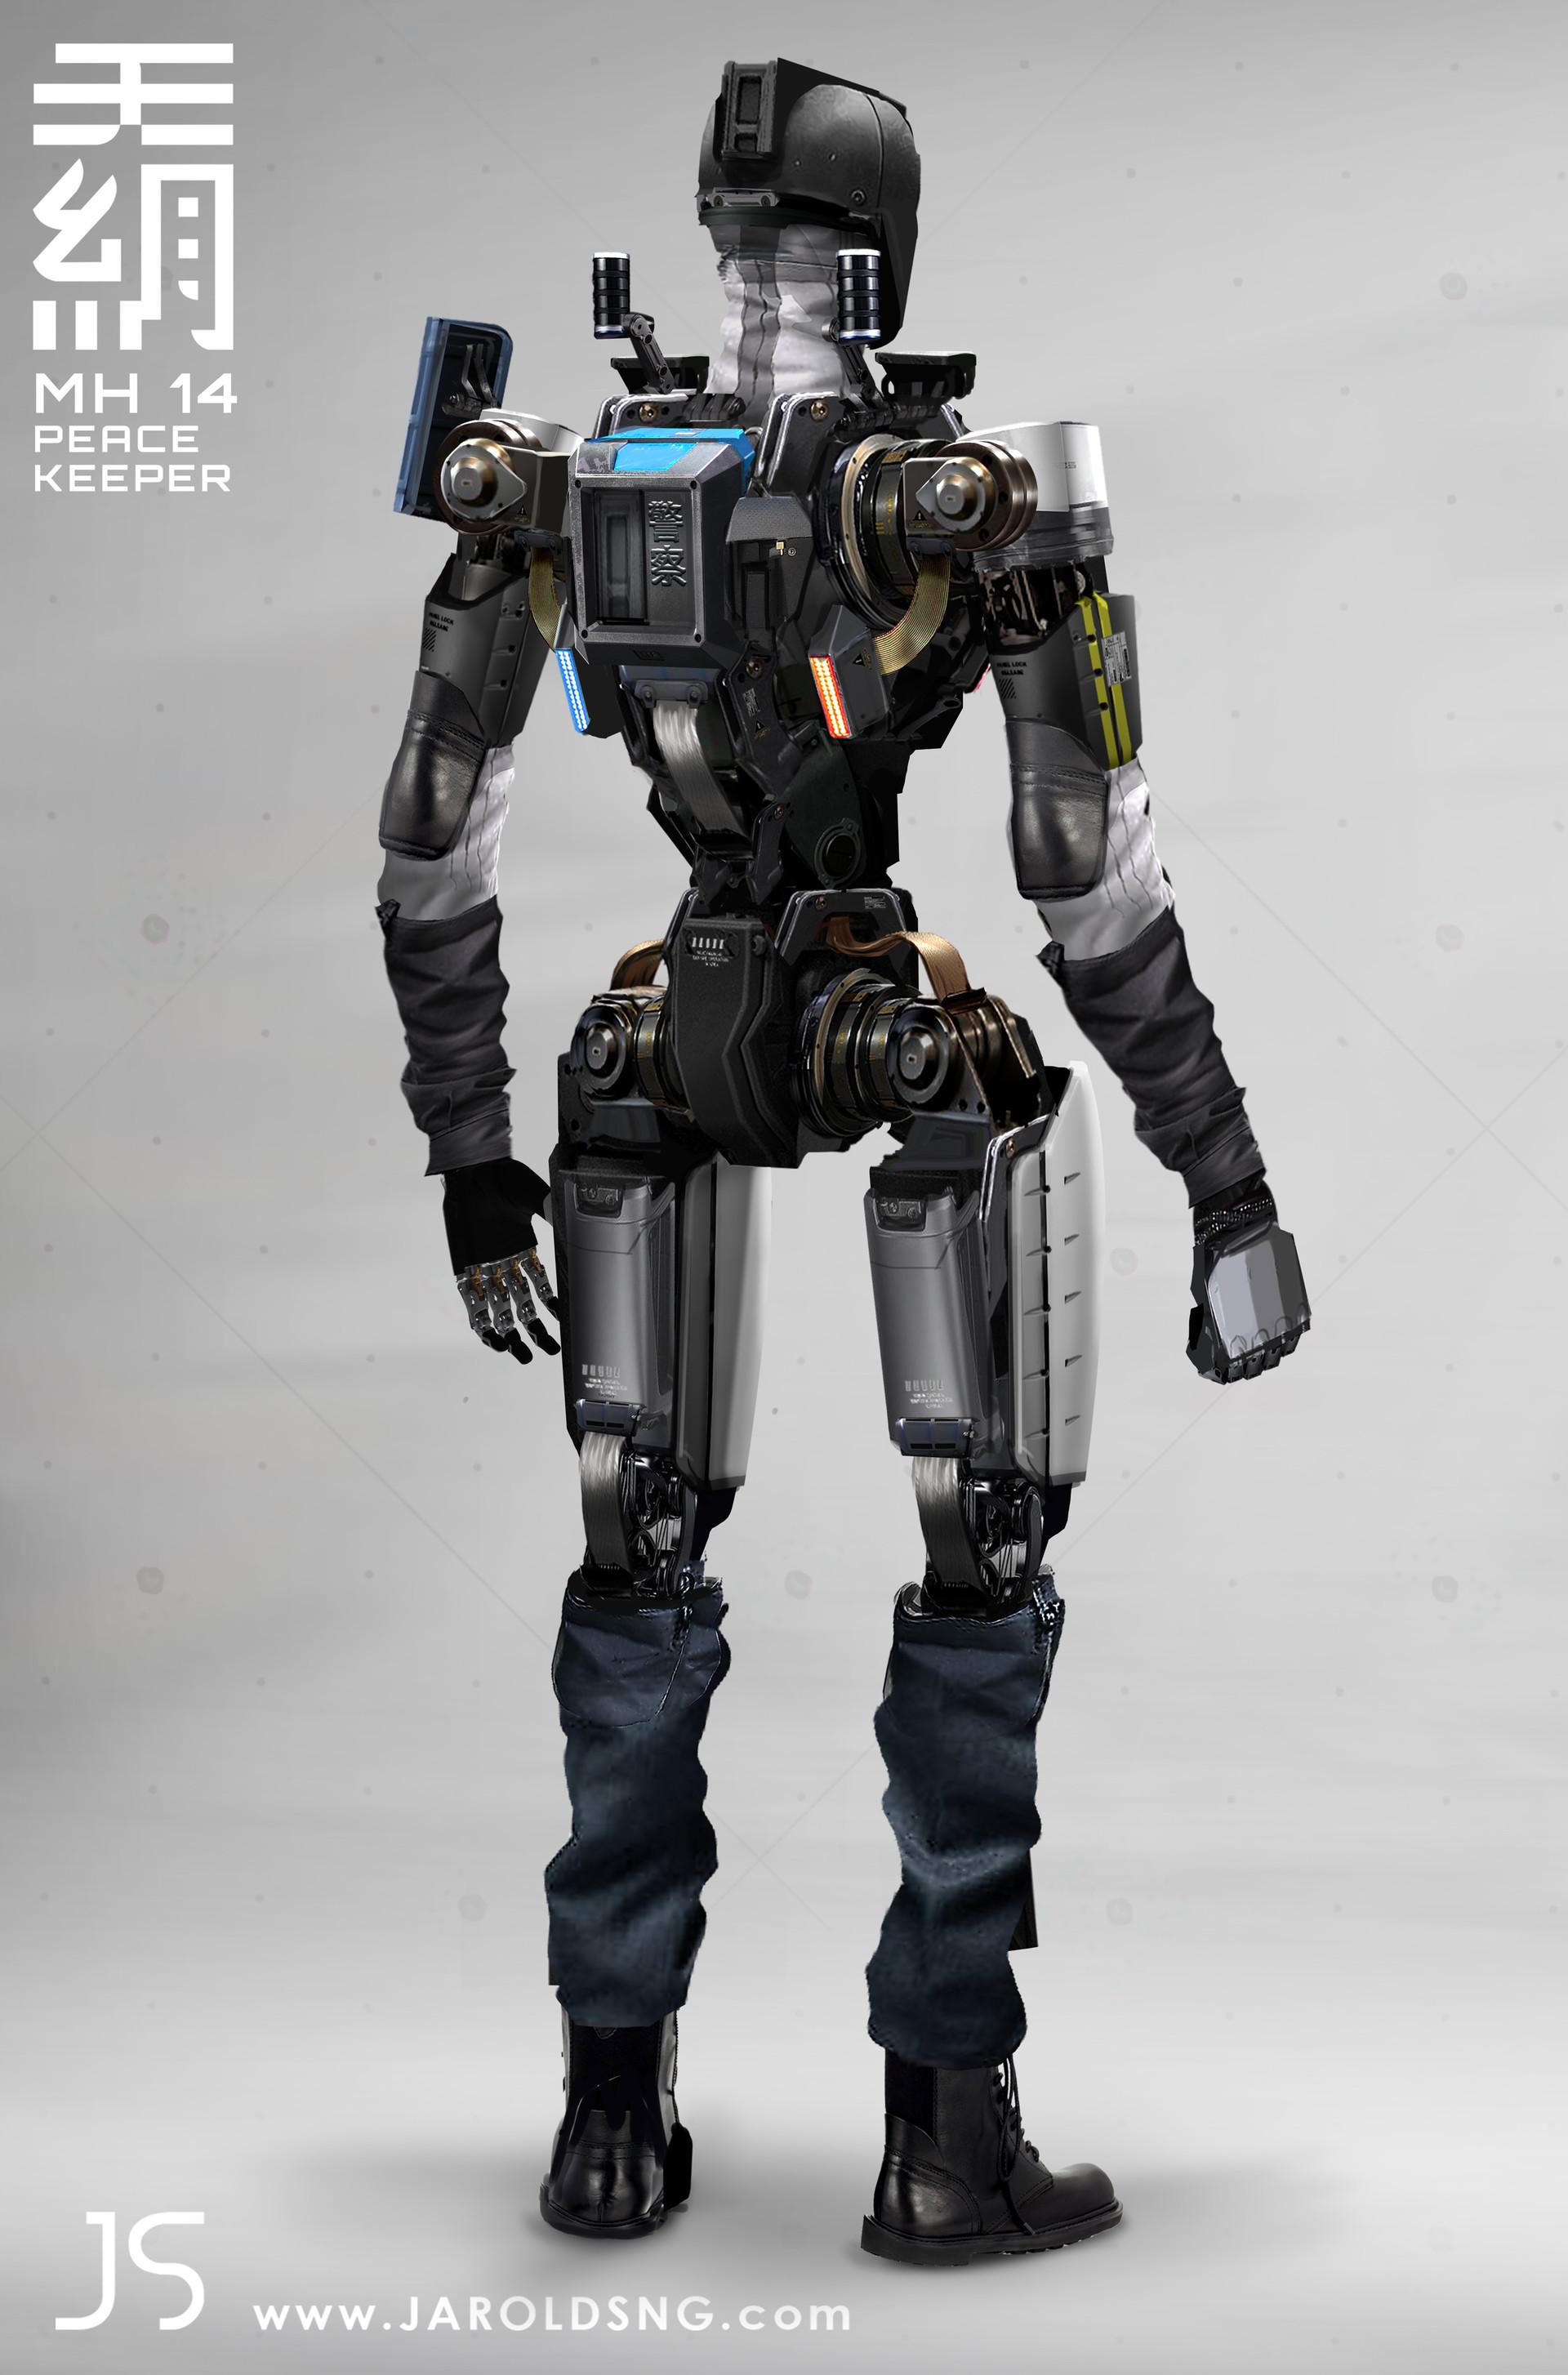 Jarold sng metalhex wa peacekeeper 04